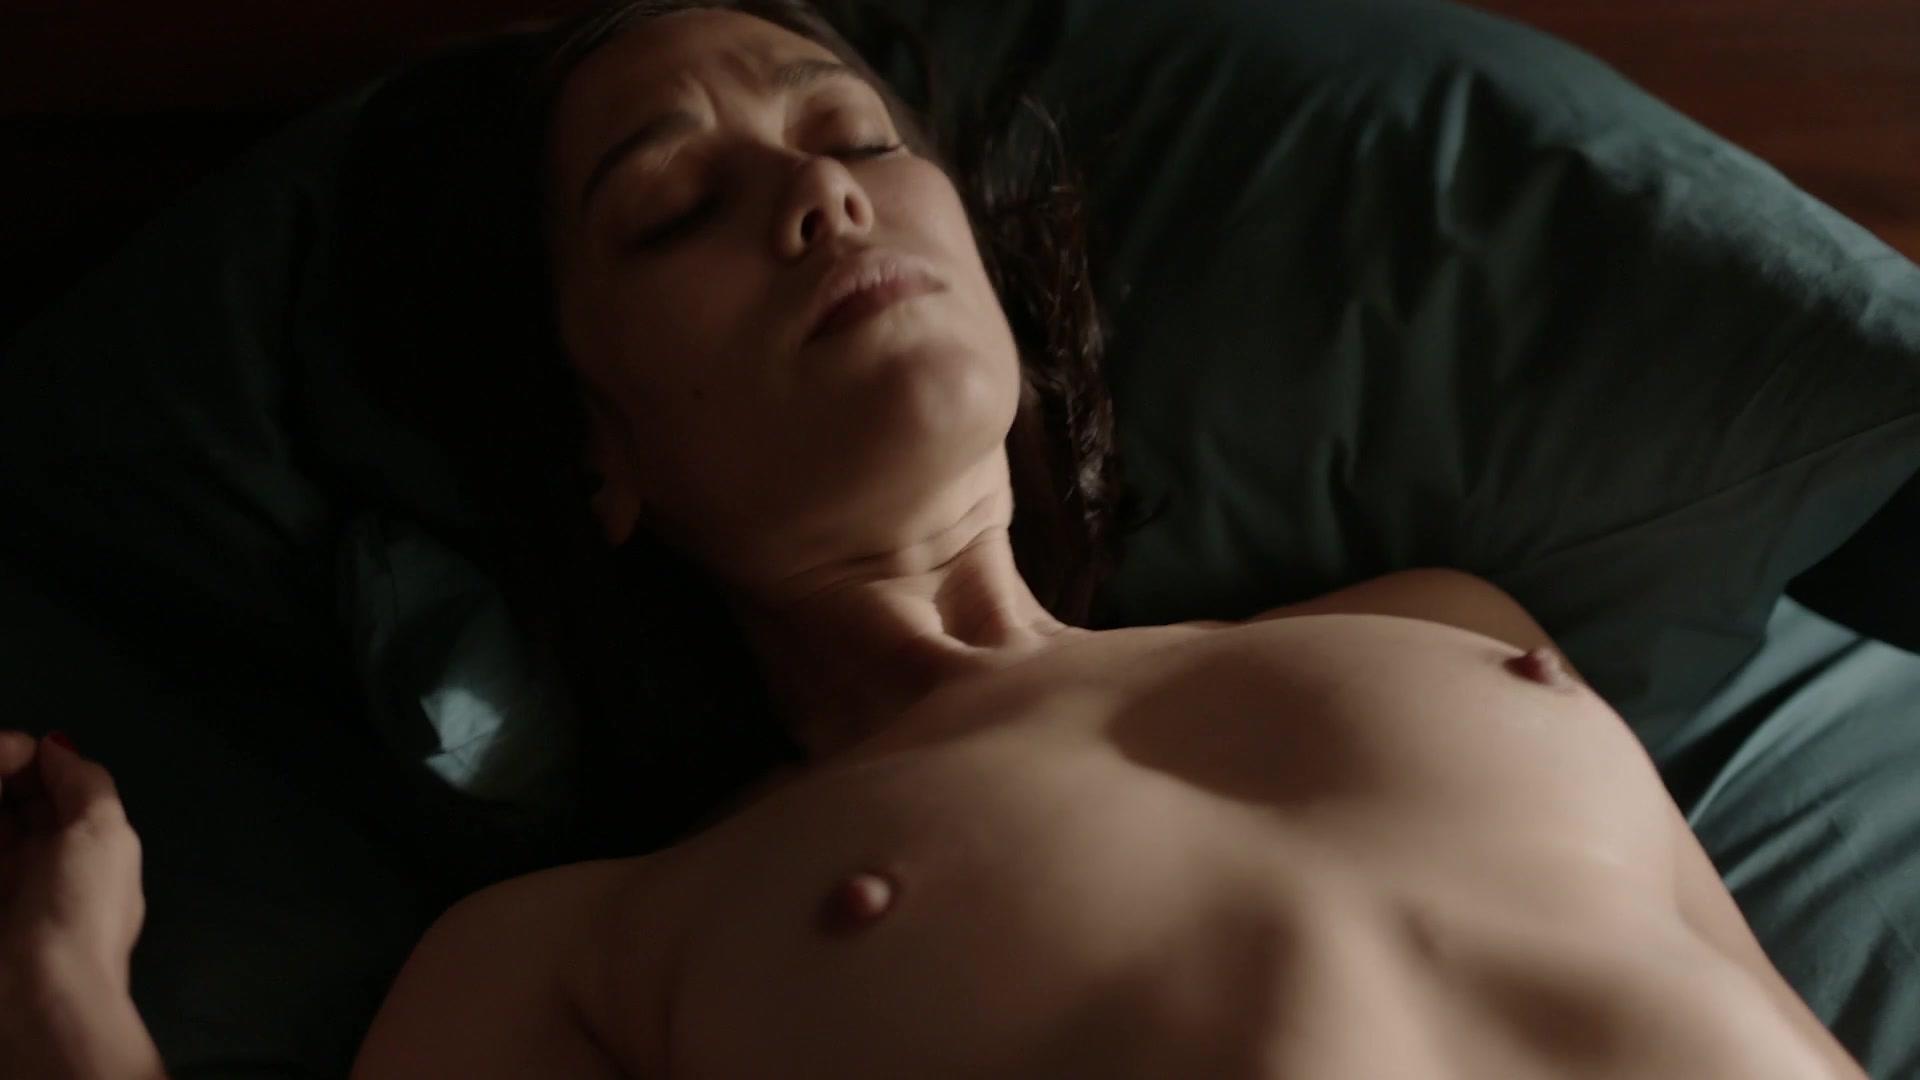 Giulia Gorietti Nude mishel prada, maria-elena laas nude - vida s02e03 (2019